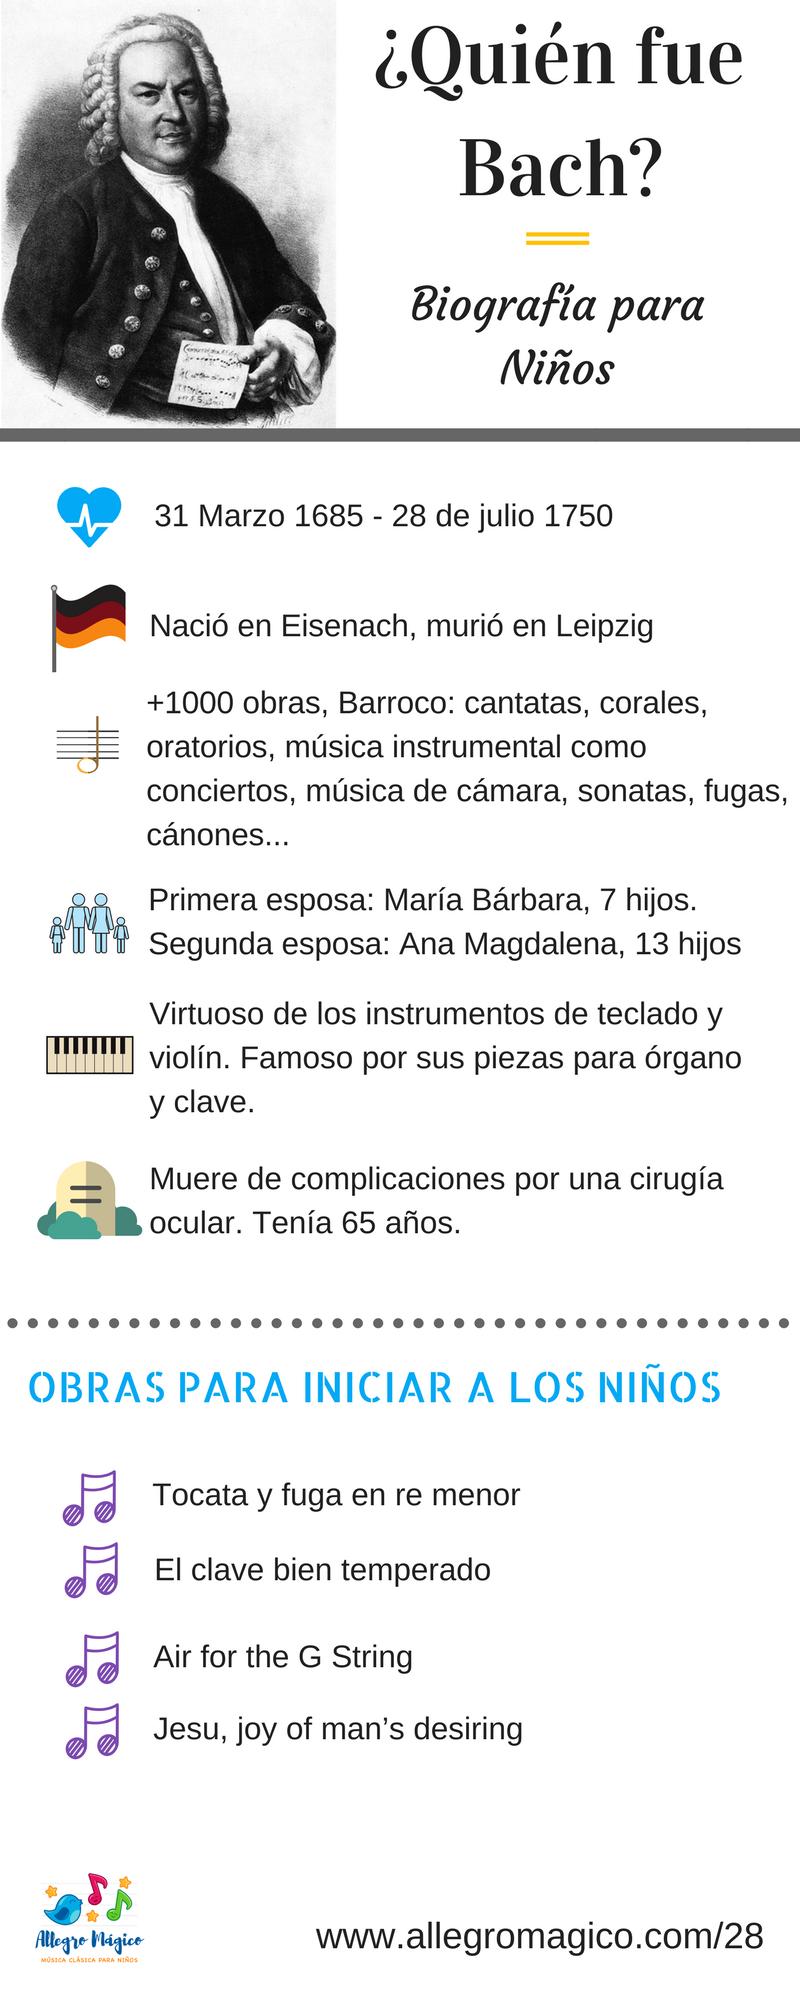 200 Ideas De Personaje Historico Personajes Historicos Infografia Arte Y Literatura